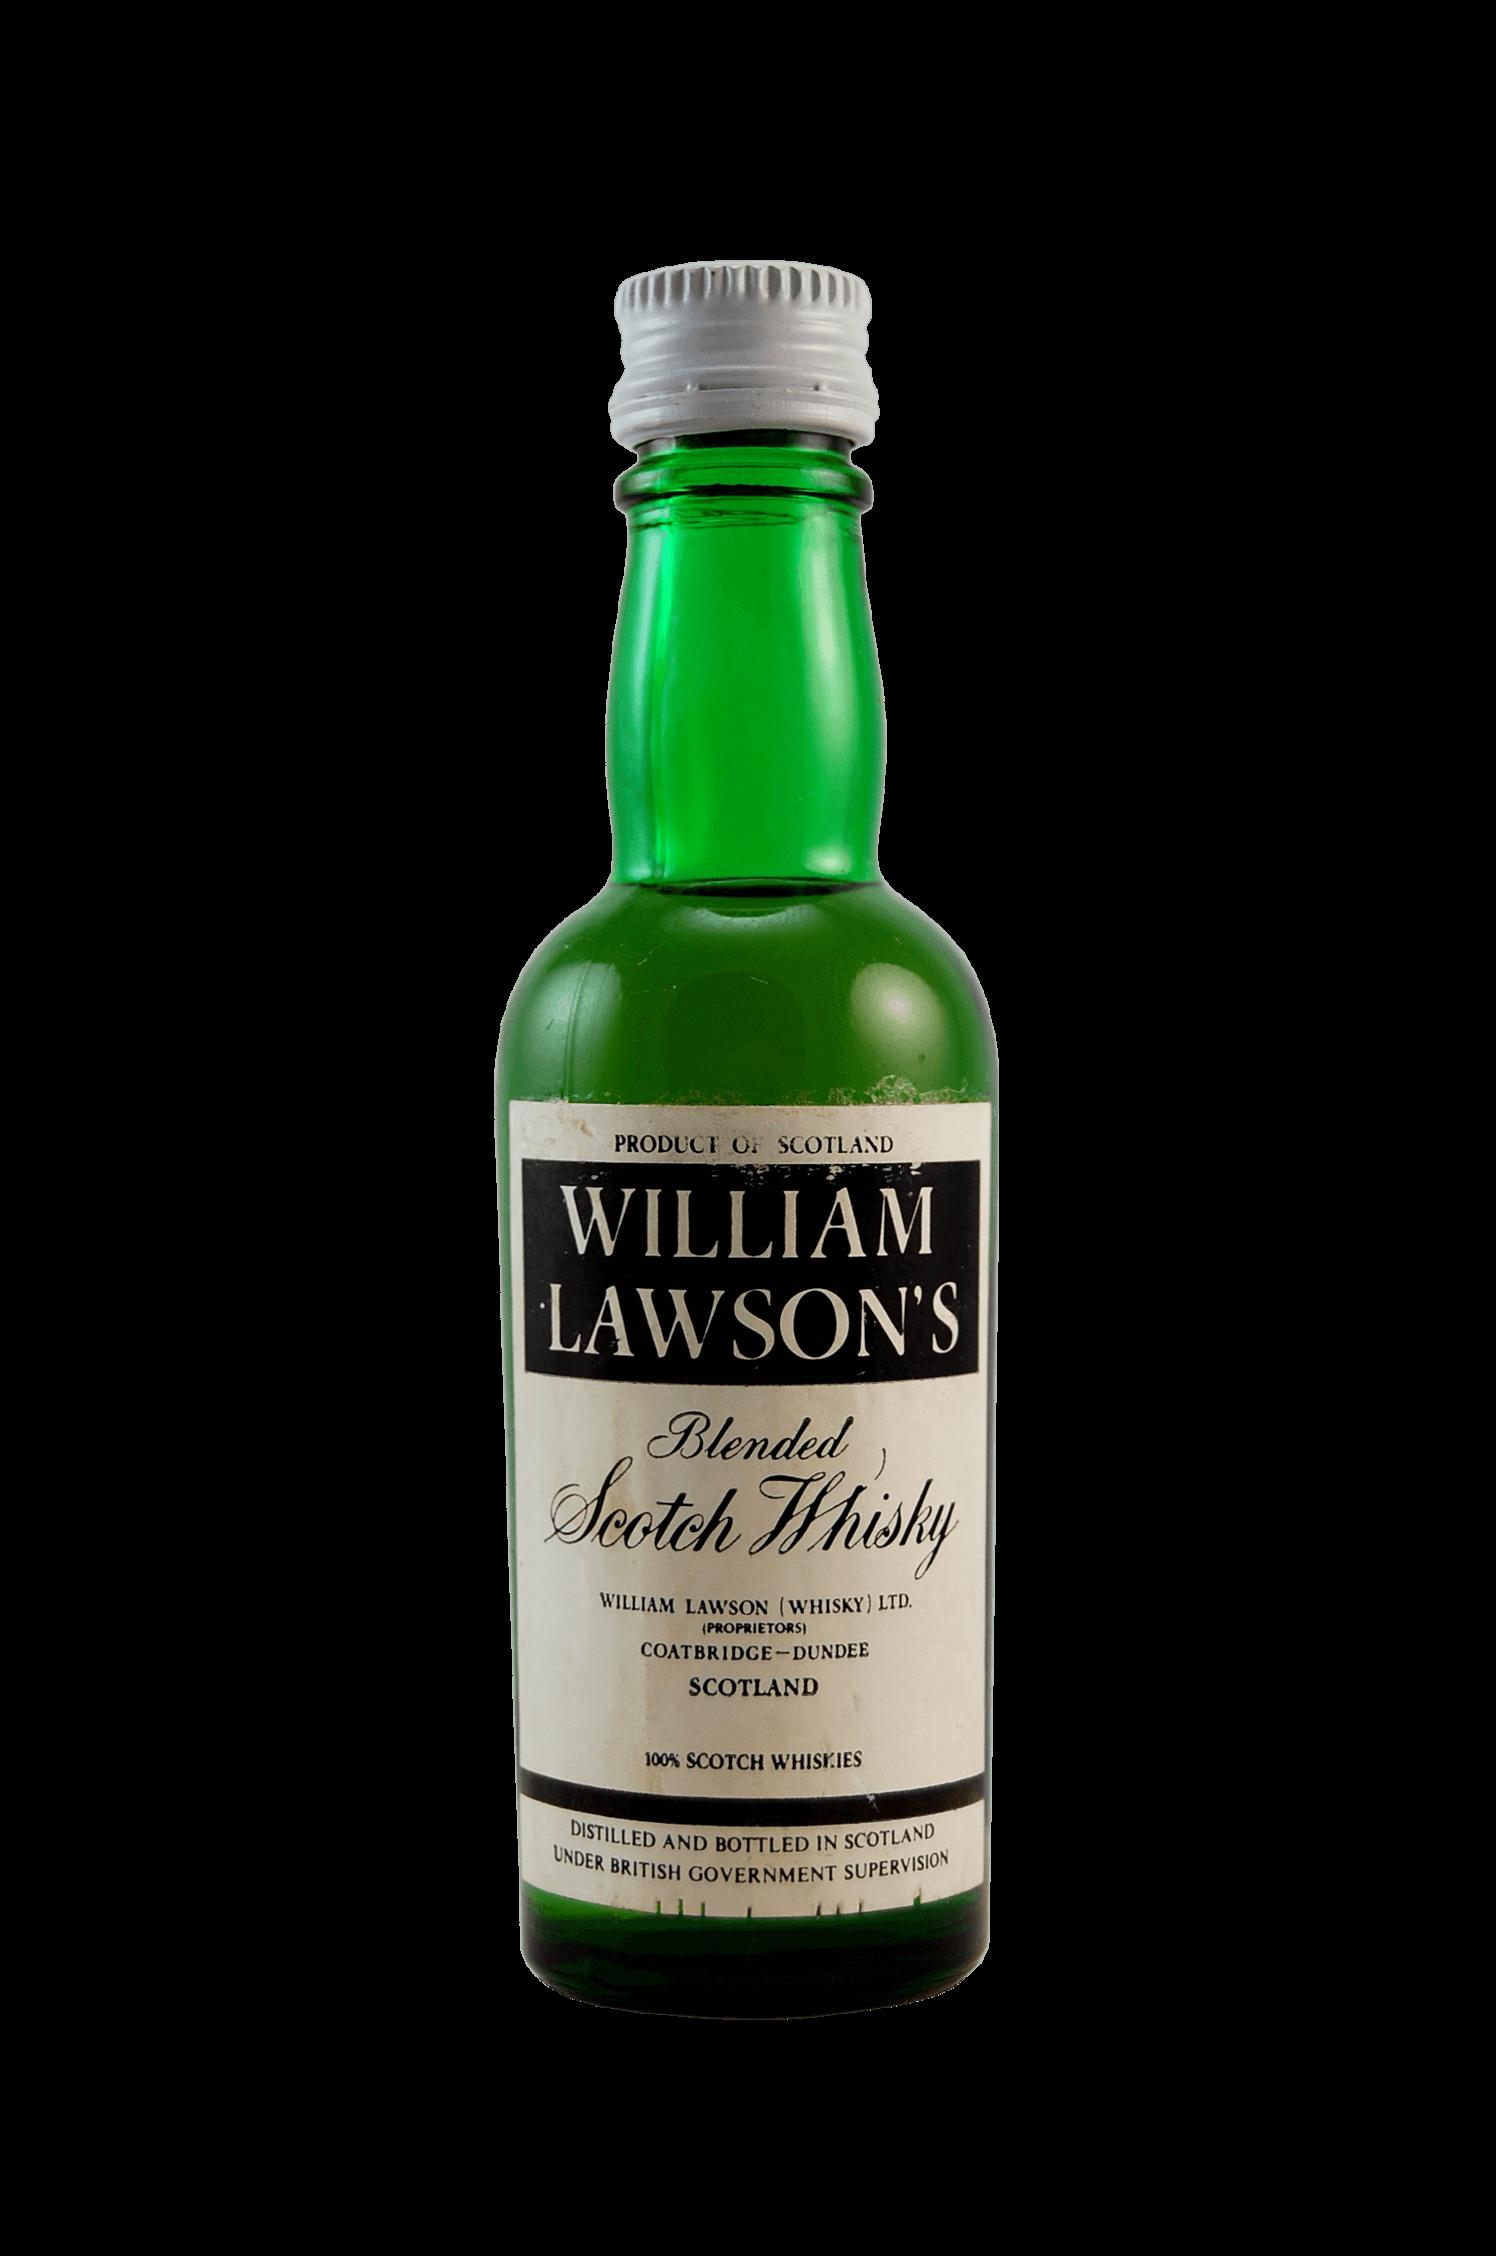 William Lawson's Whisky